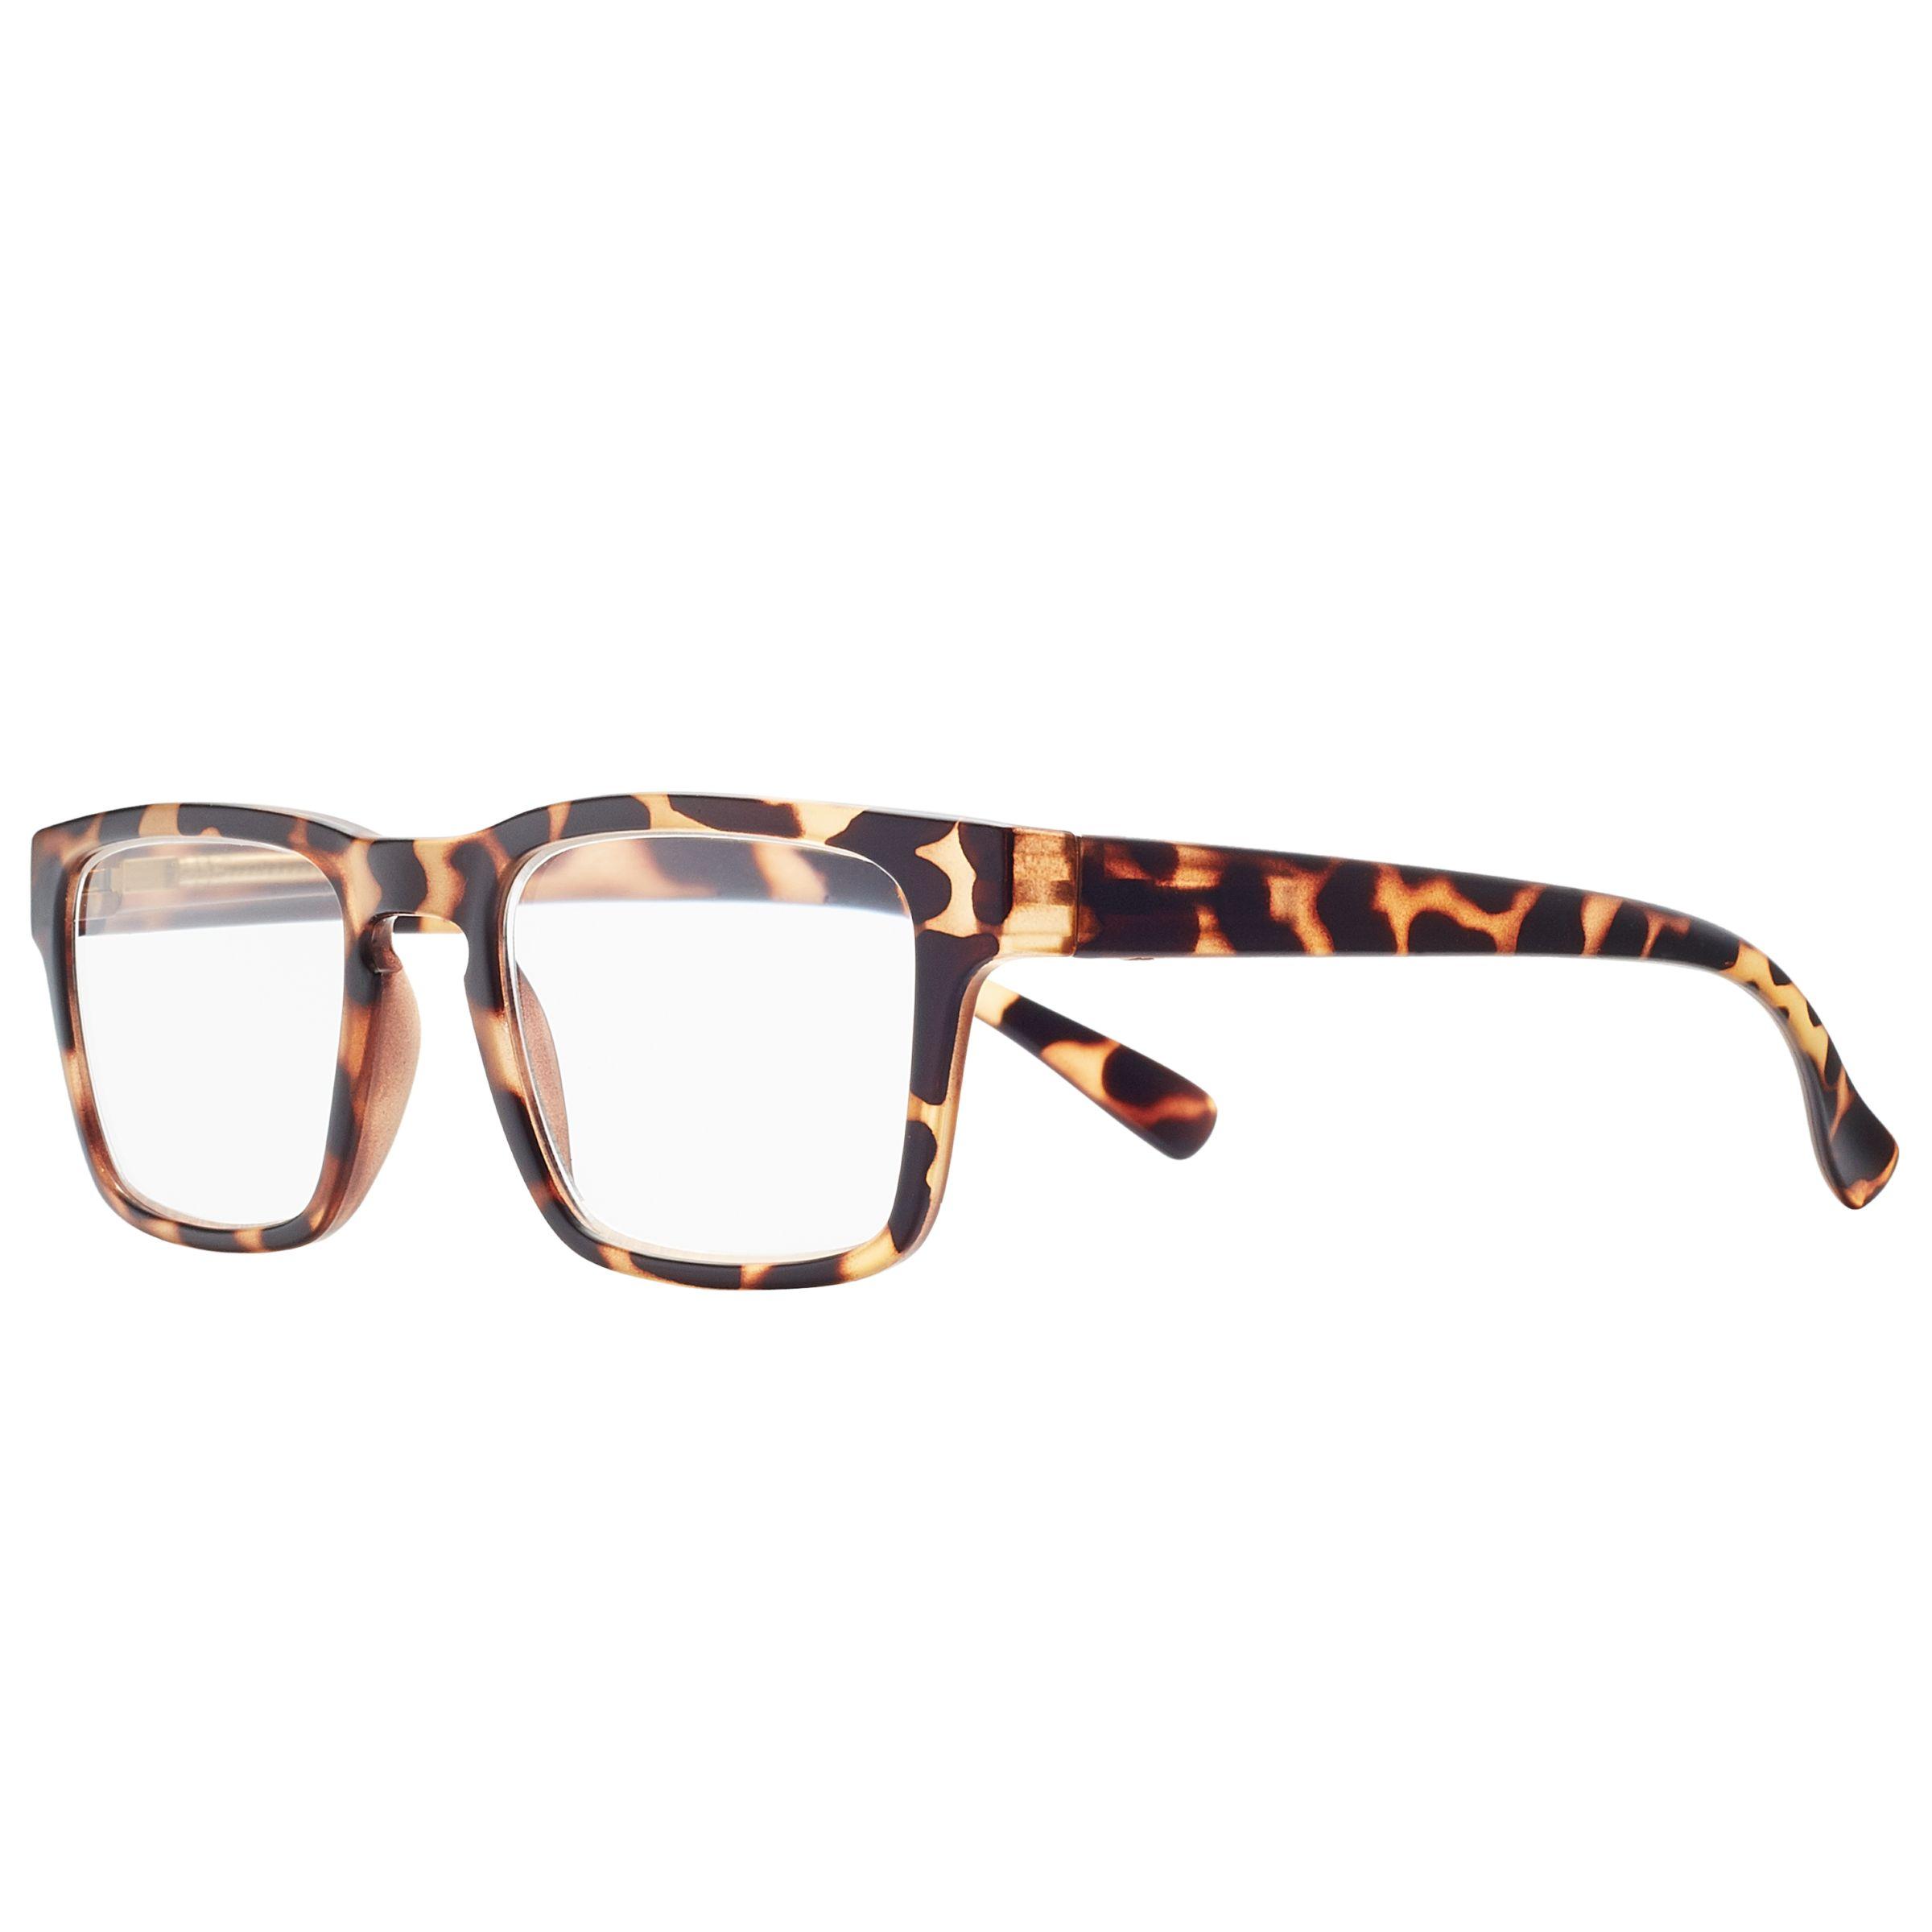 Magnif Eyes Magnif Eyes Ready Readers Laramie Glasses, Tortoise